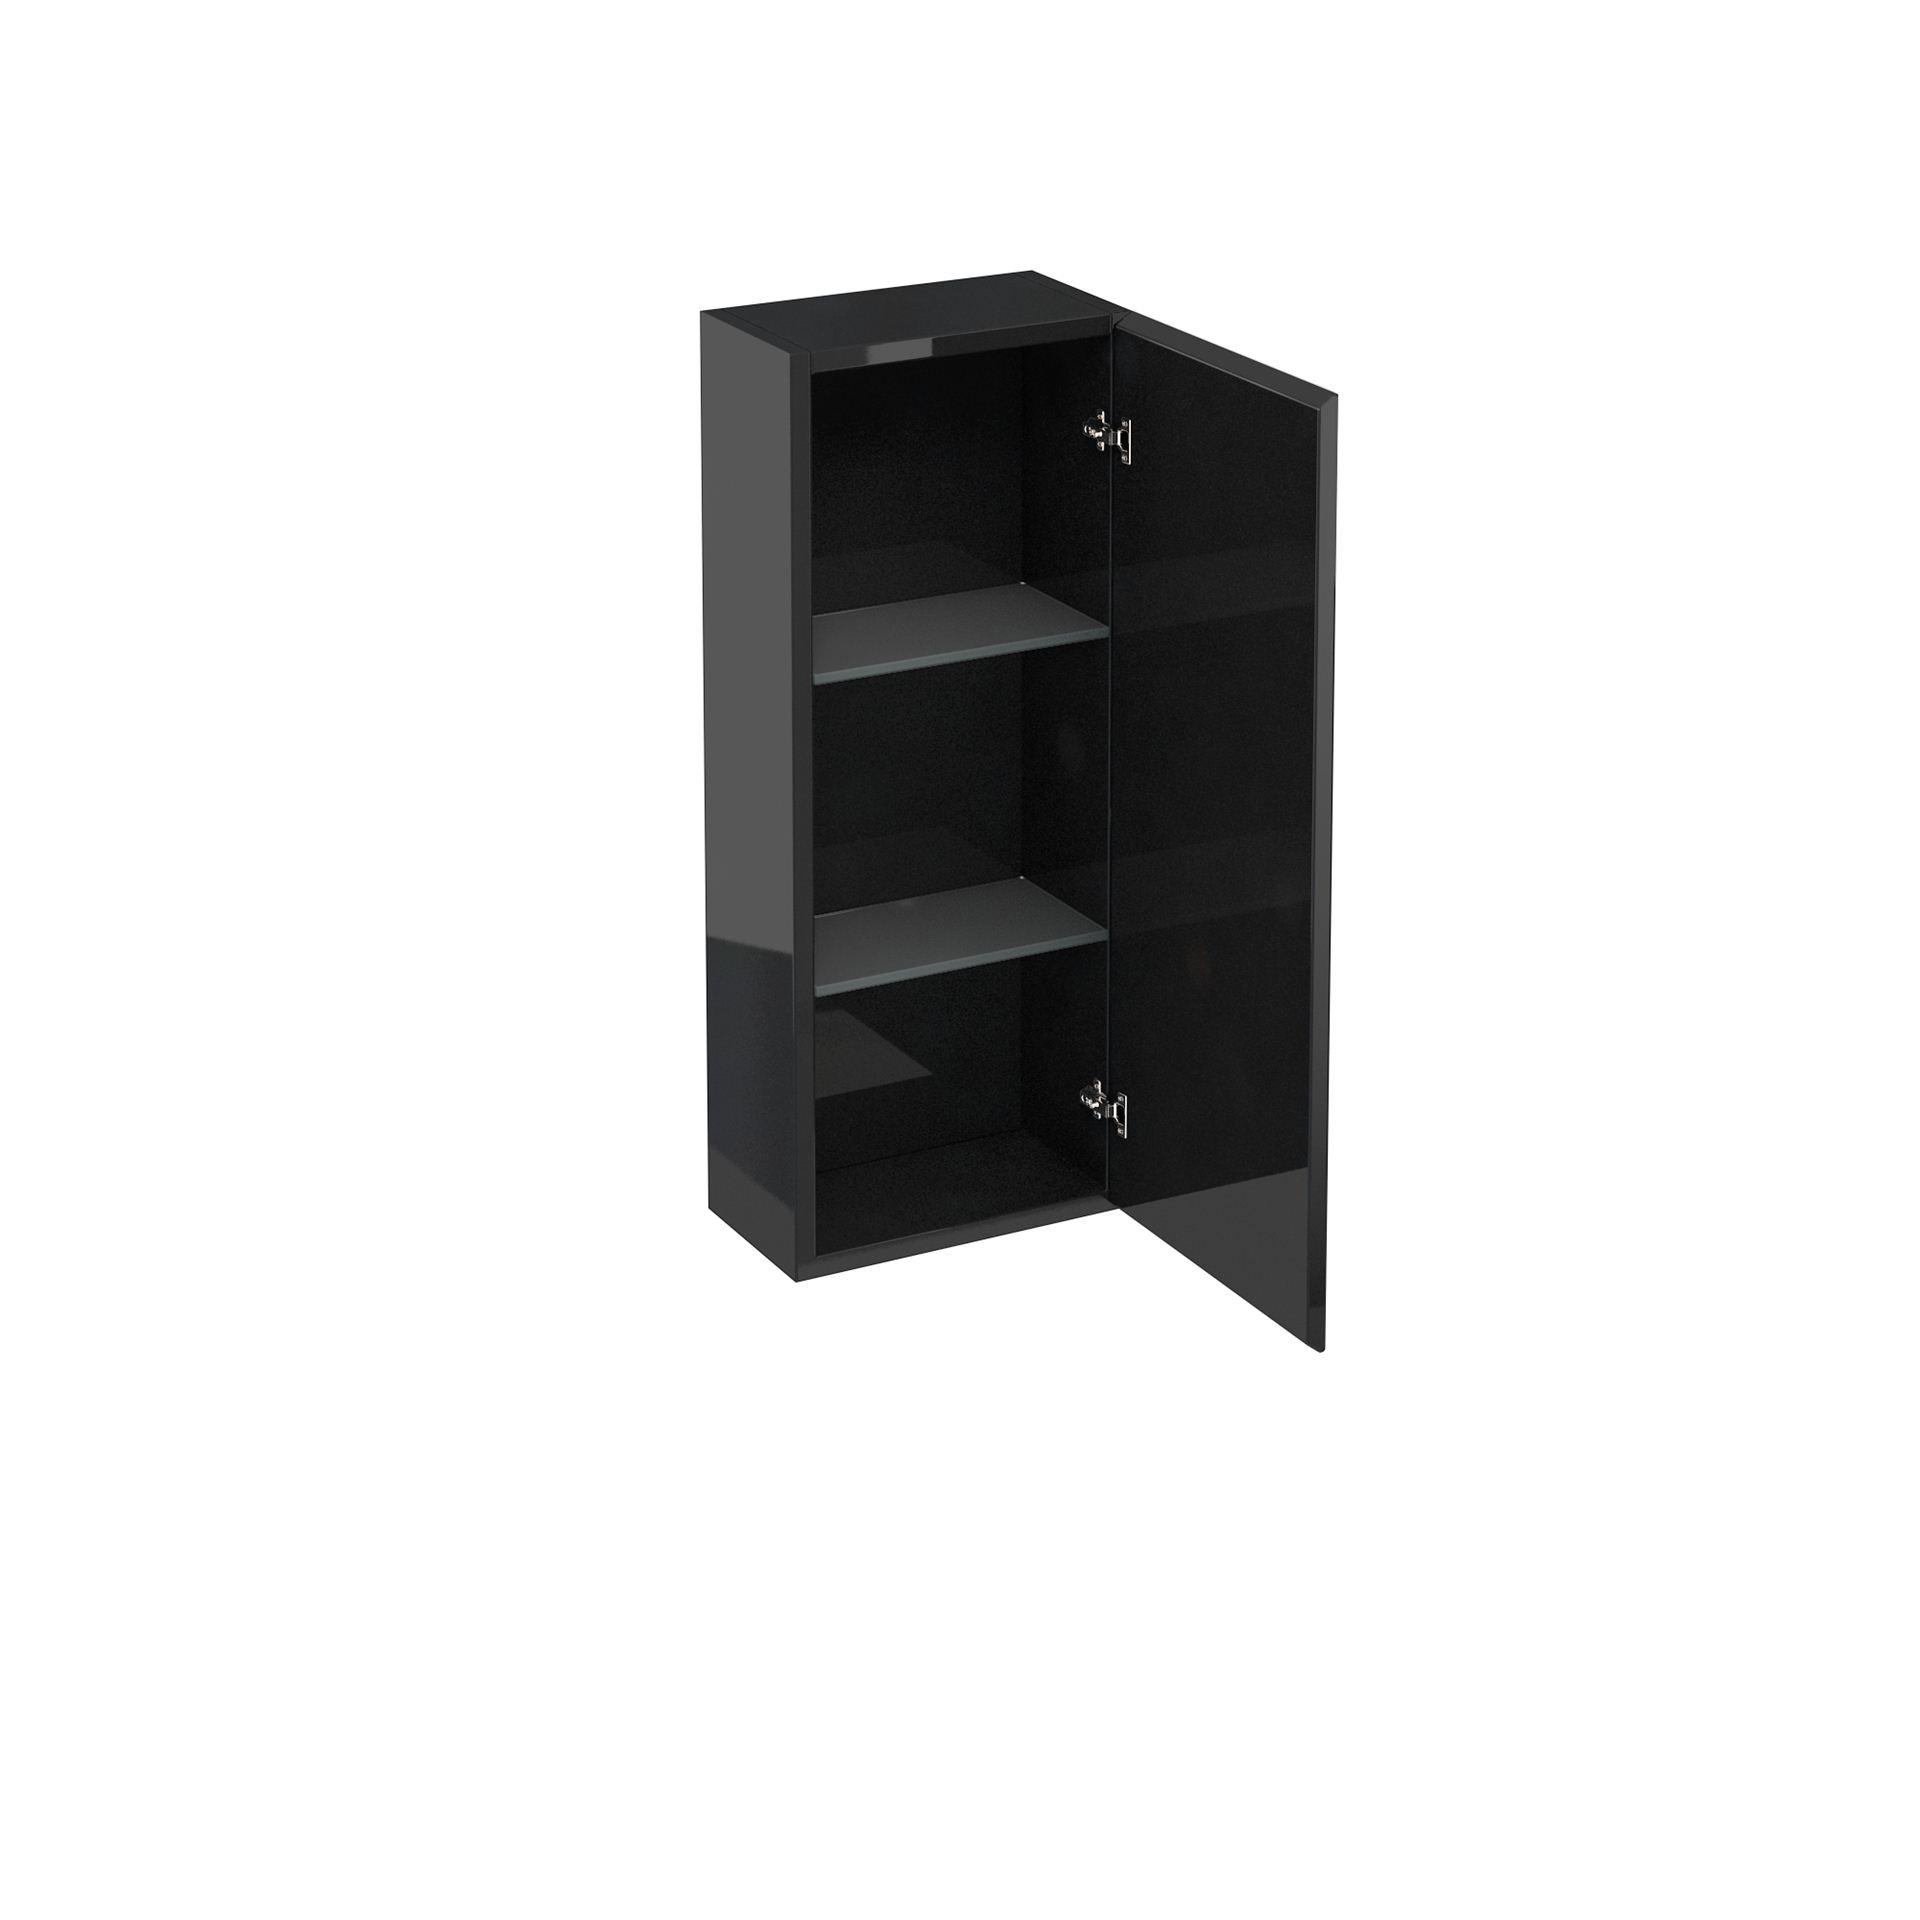 Britton Aqua Cabinets 300mm Single Wall Mounted Bathroom Cupboard